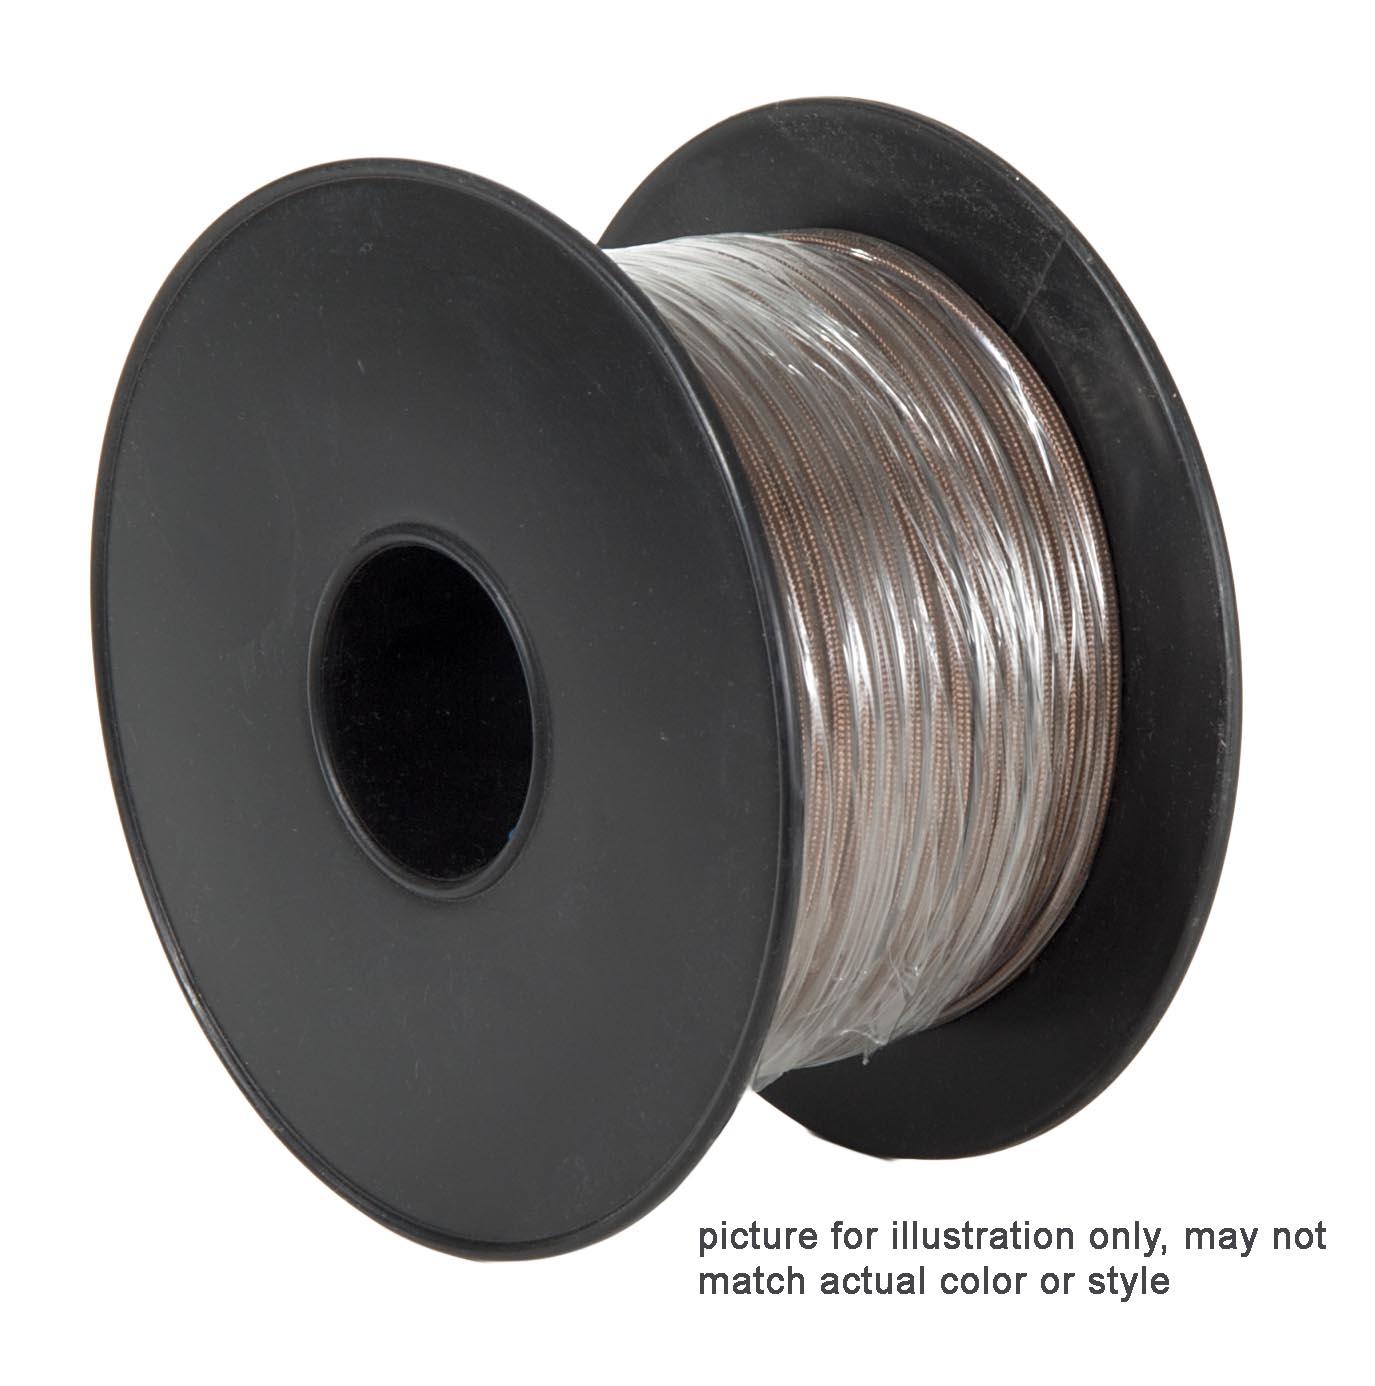 Clear PVC 3-wire Medium Duty Spooled Lamp Cord 46618 | B&P Lamp Supply